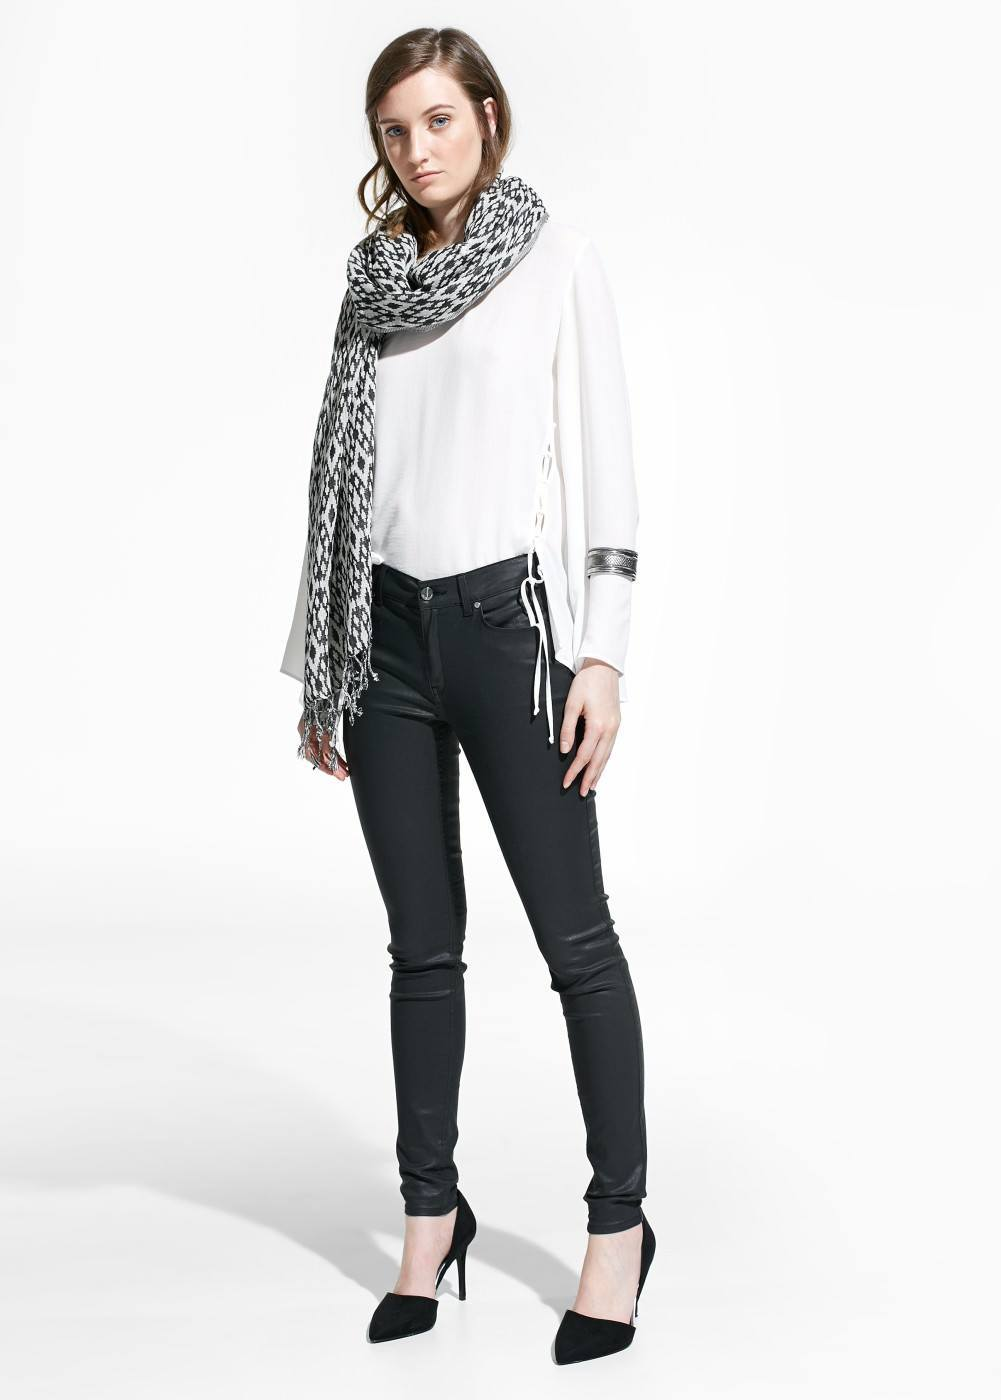 pantalones-y-jeans-mujer-2015-tendencias